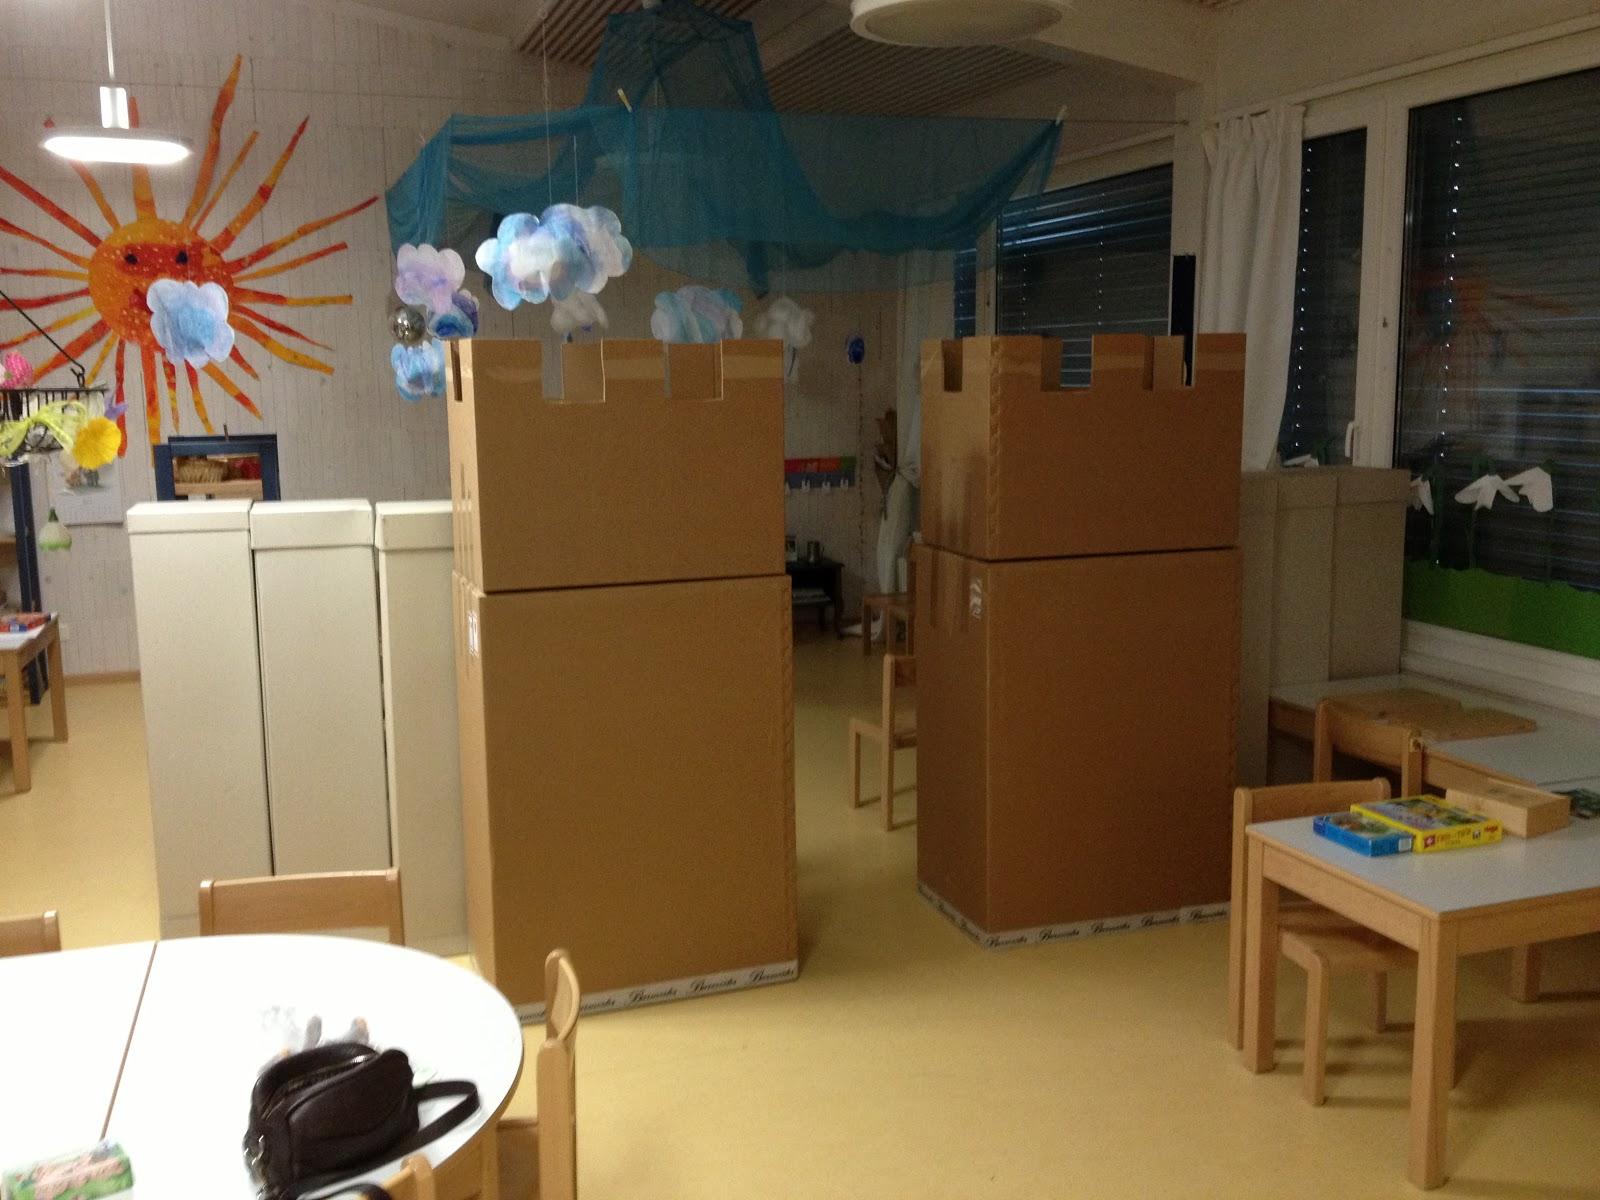 Kindergarten Kessel: Burg Kesselstein